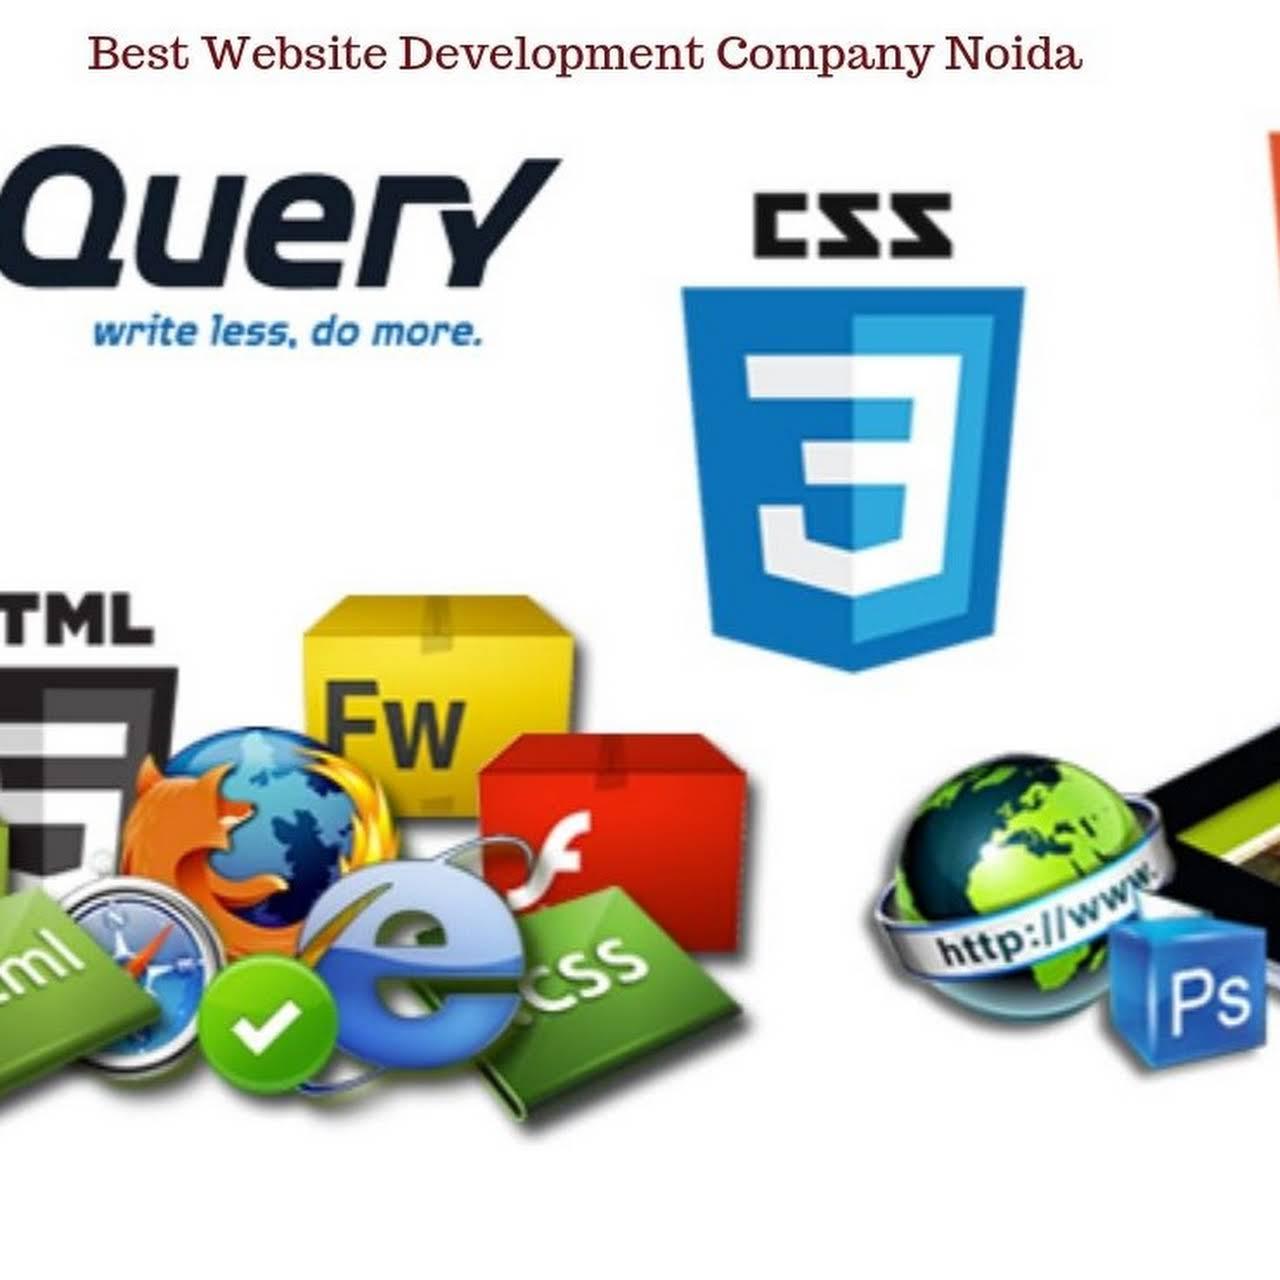 Conception Digital Services : Web Design and Development